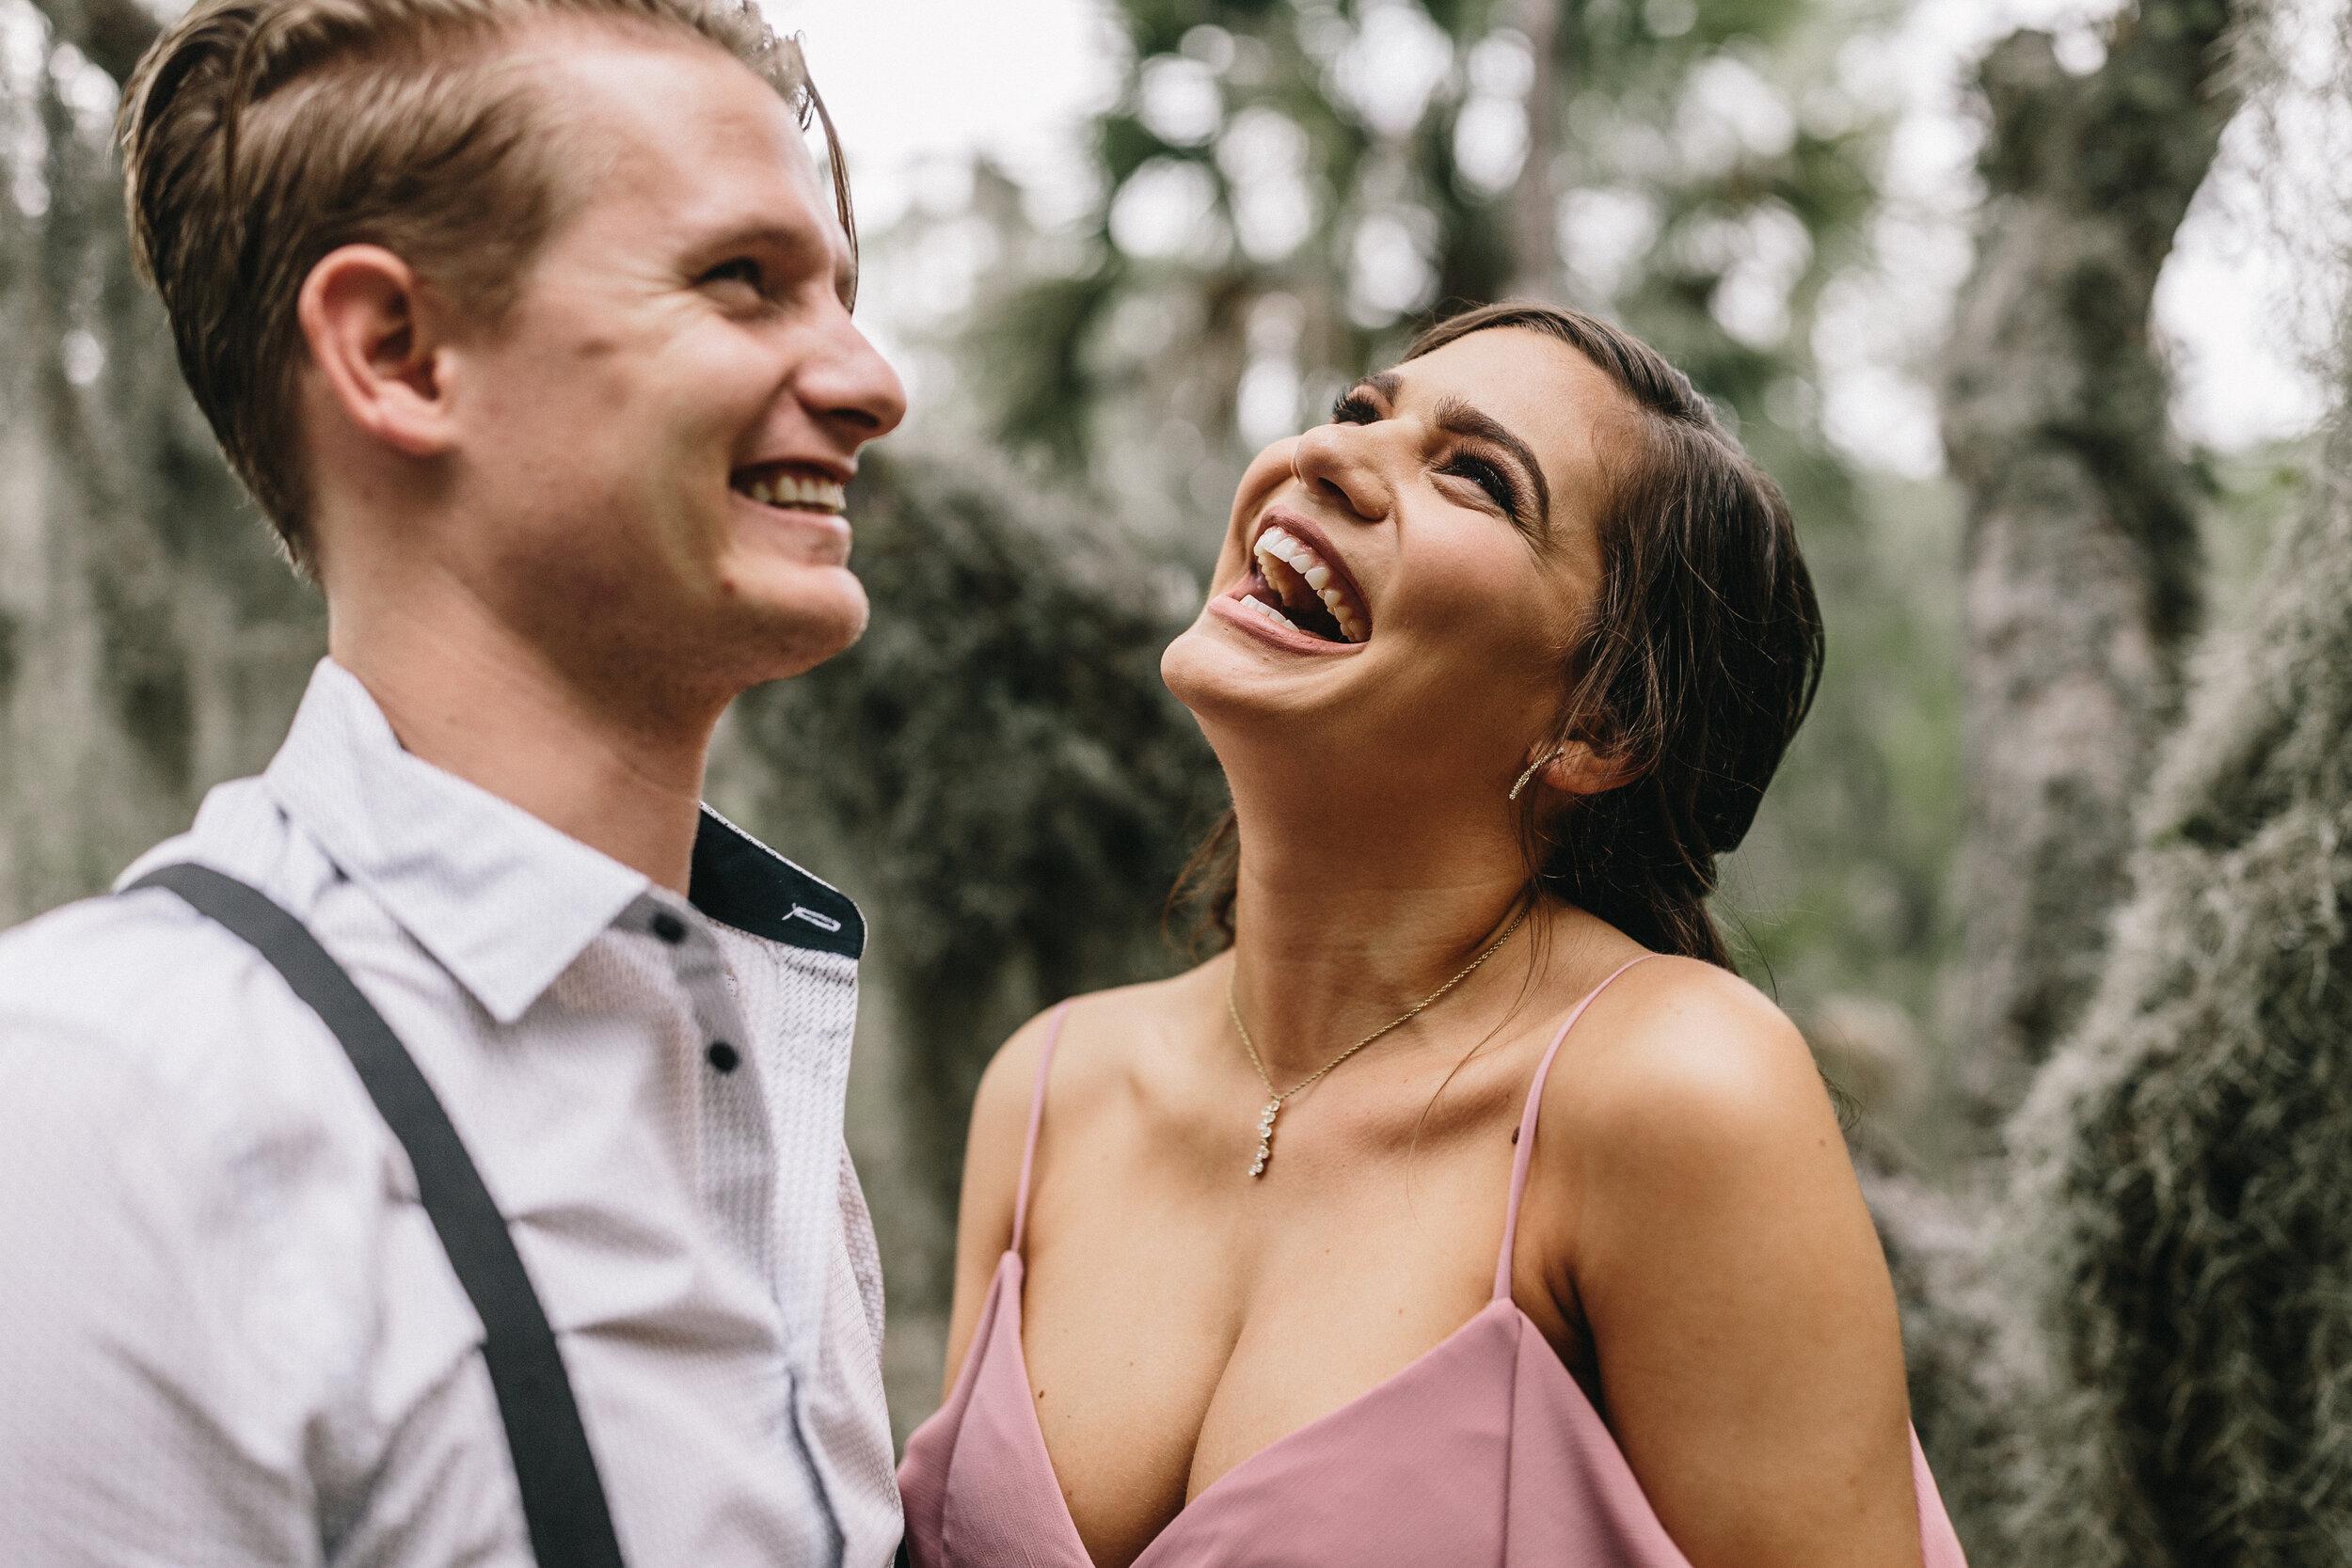 ivory-and-beau-couple-weddings-engagement-session-savannah-weddings-Mary+Cameron_engagementsession-4.jpg